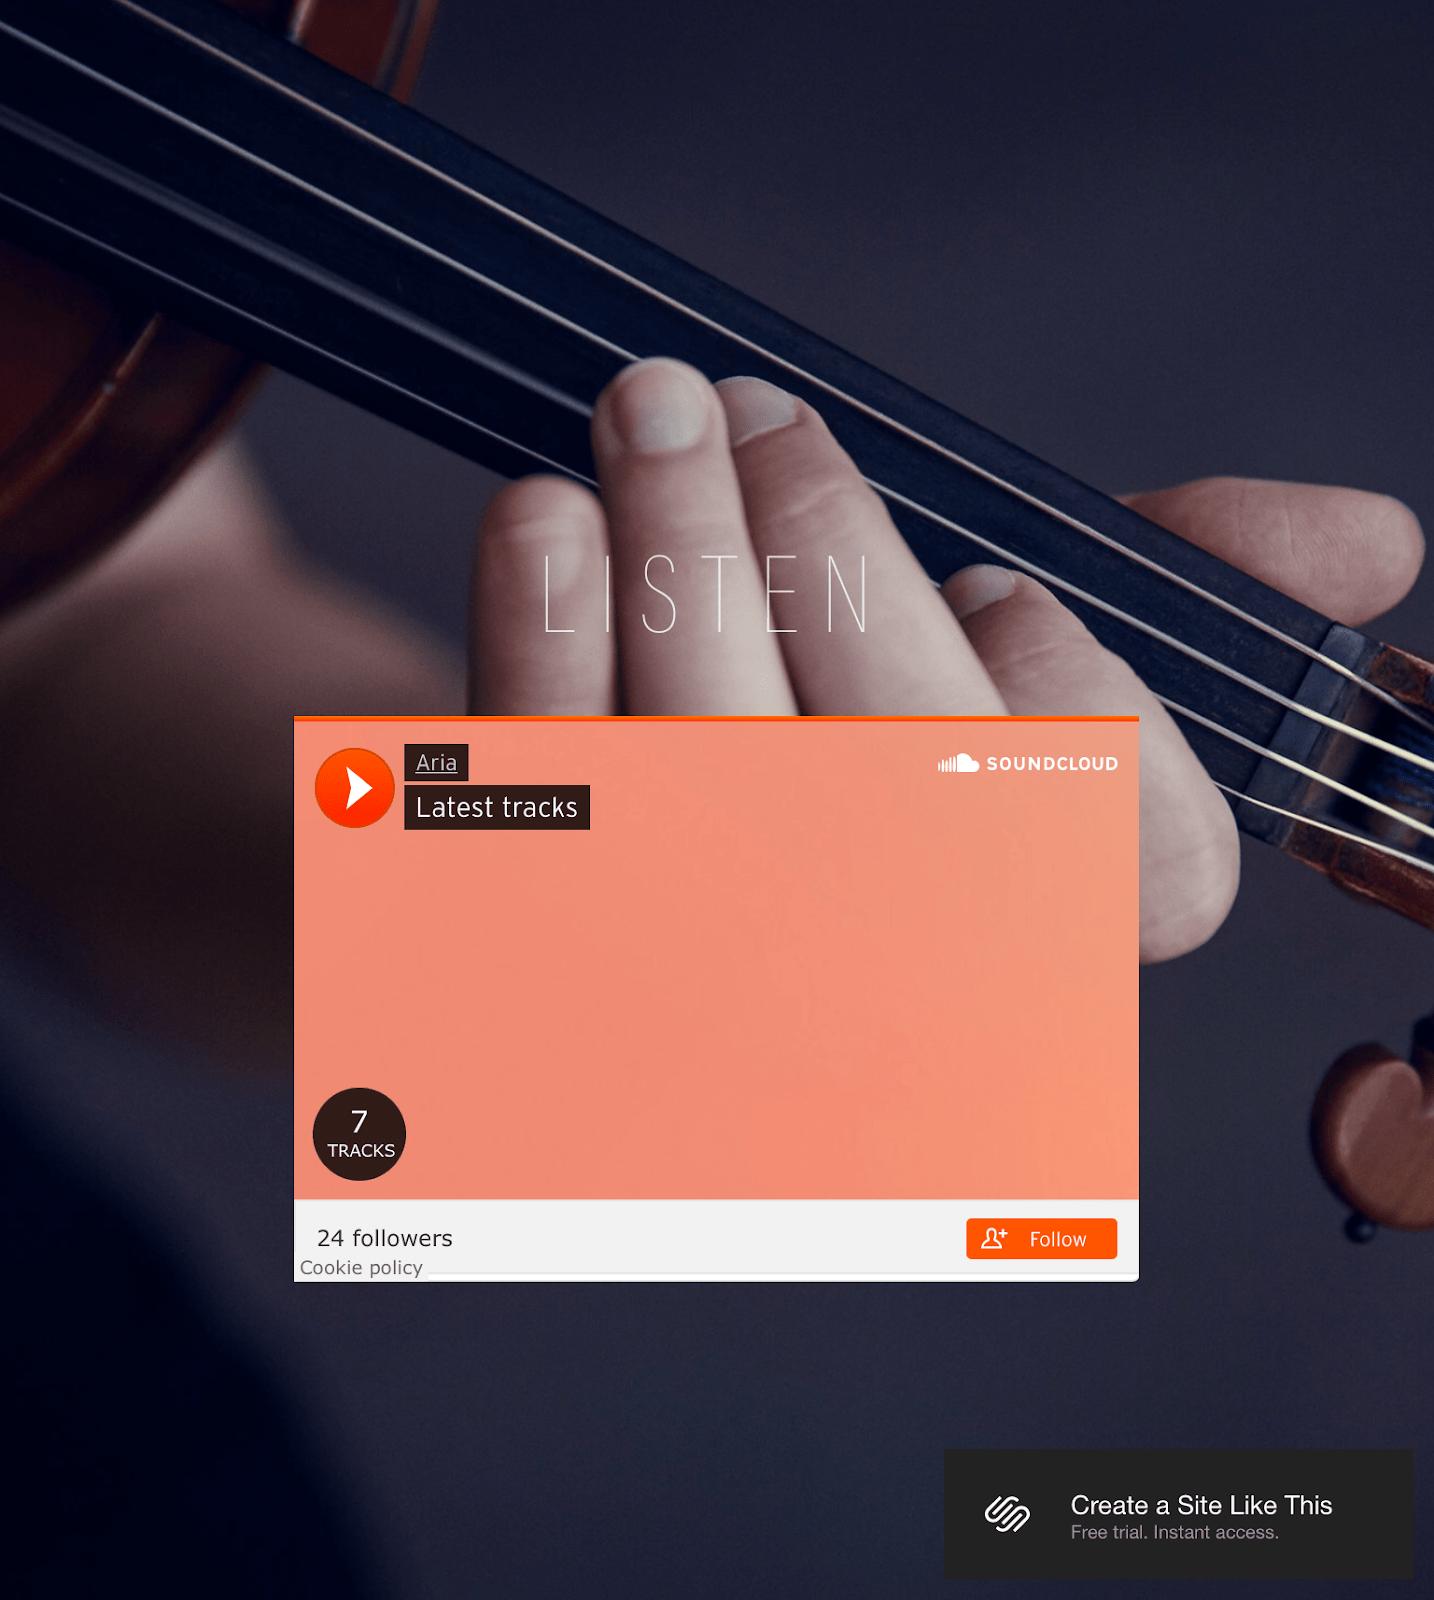 Aria music player